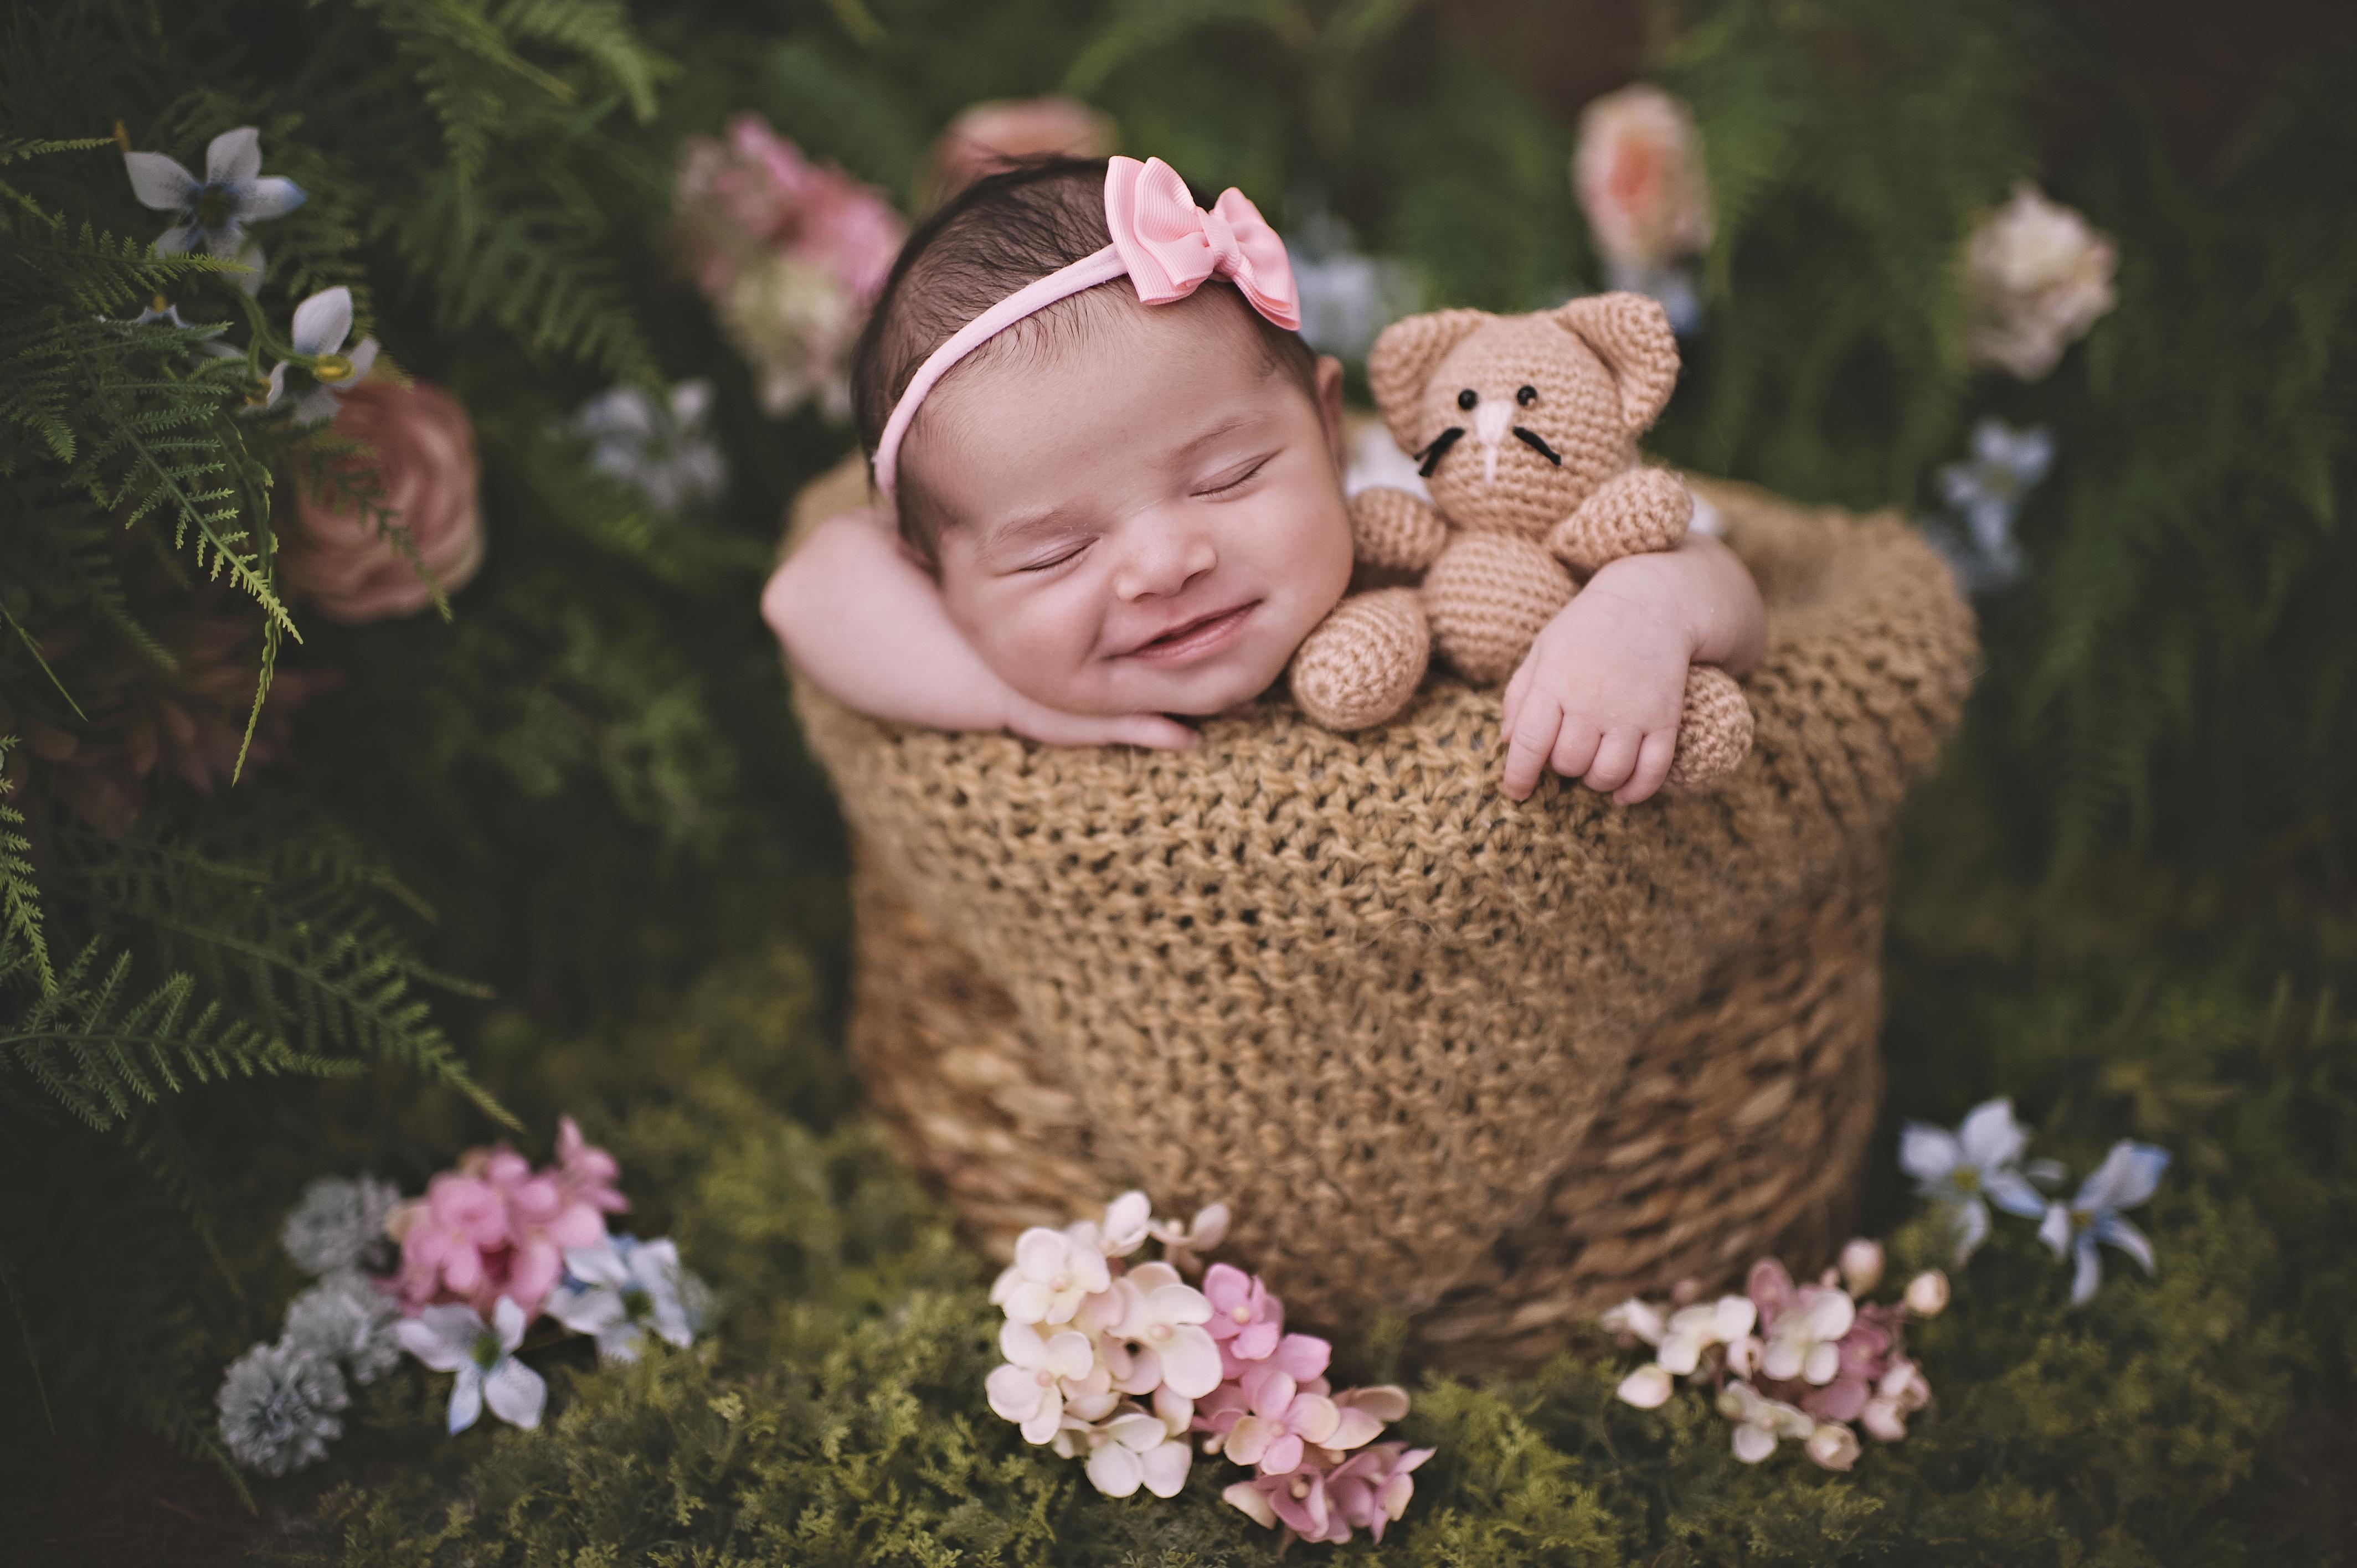 Contate Rita Rodrigues Fotografia - fotógrafa especializada em fotografia newborn, fotografia de bebês e gestantes